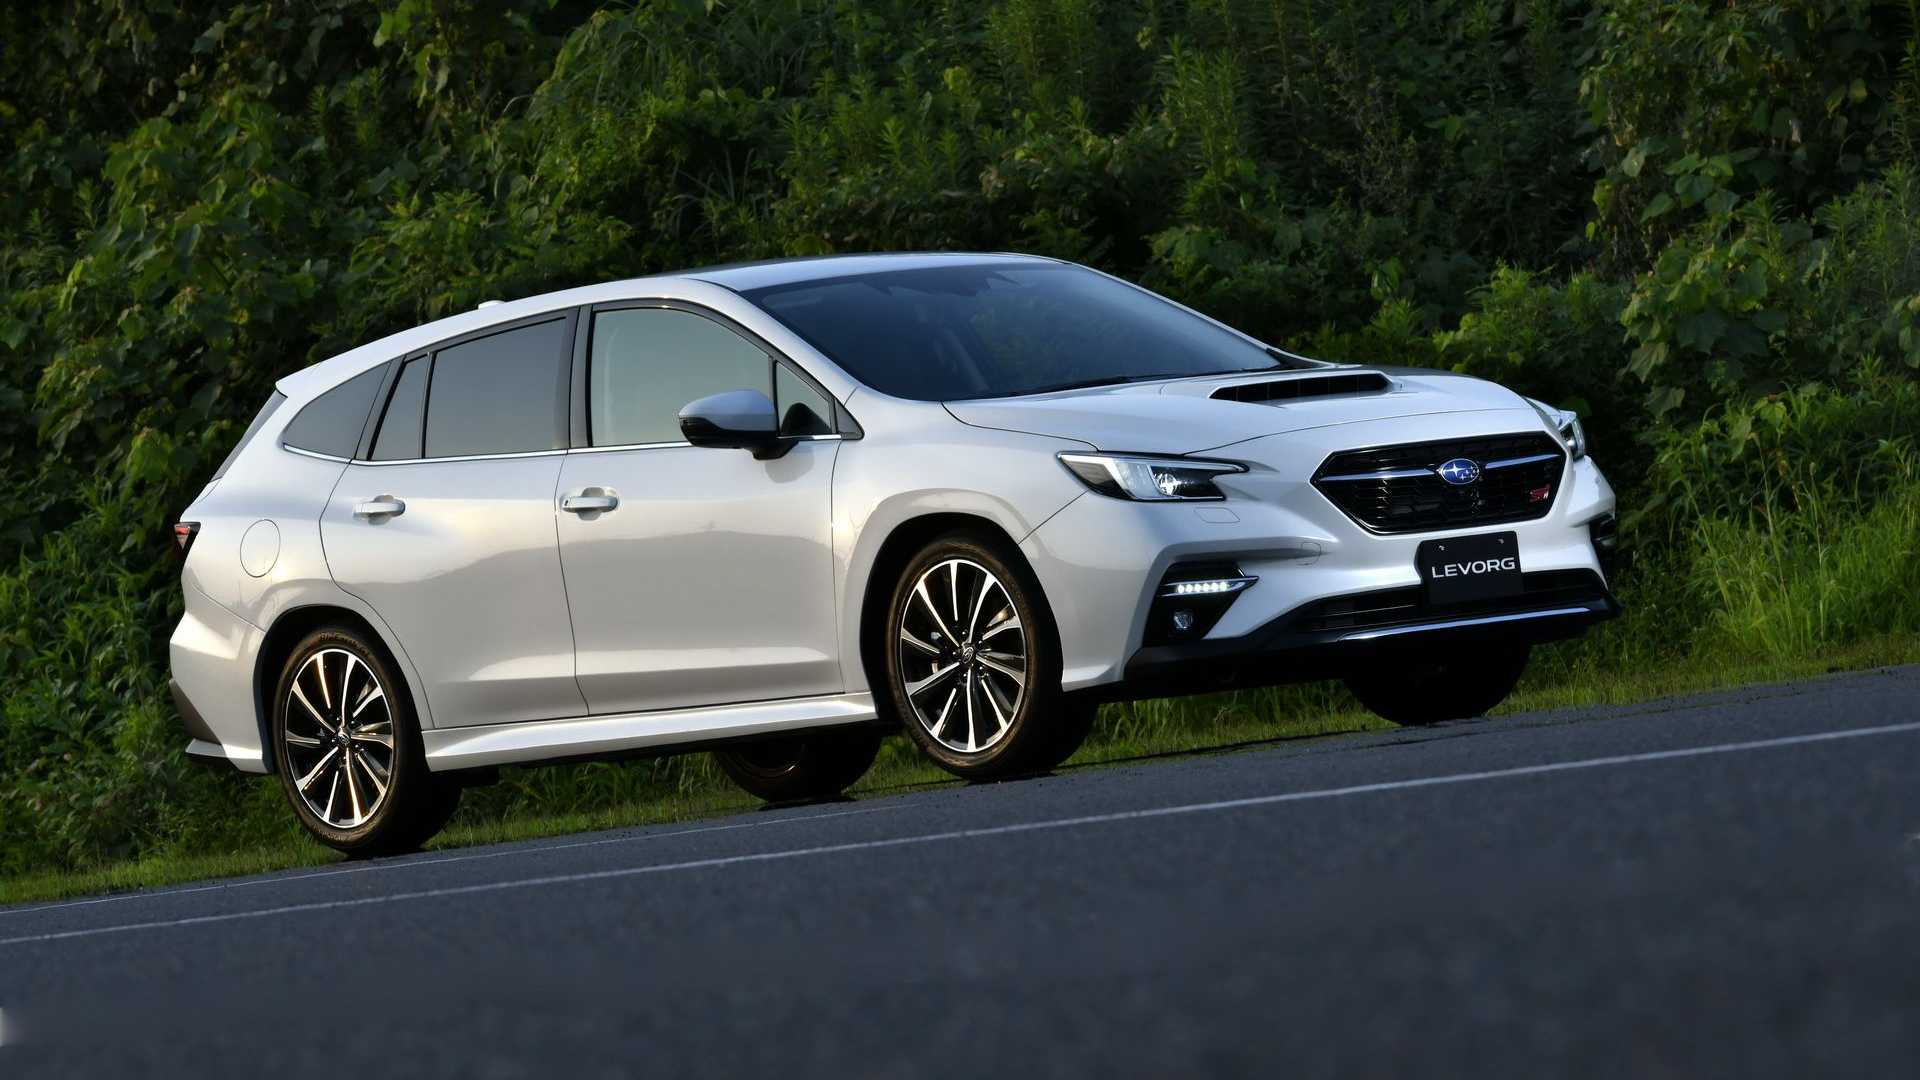 2021 subaru levorg wagon revealed could hint at next wrx